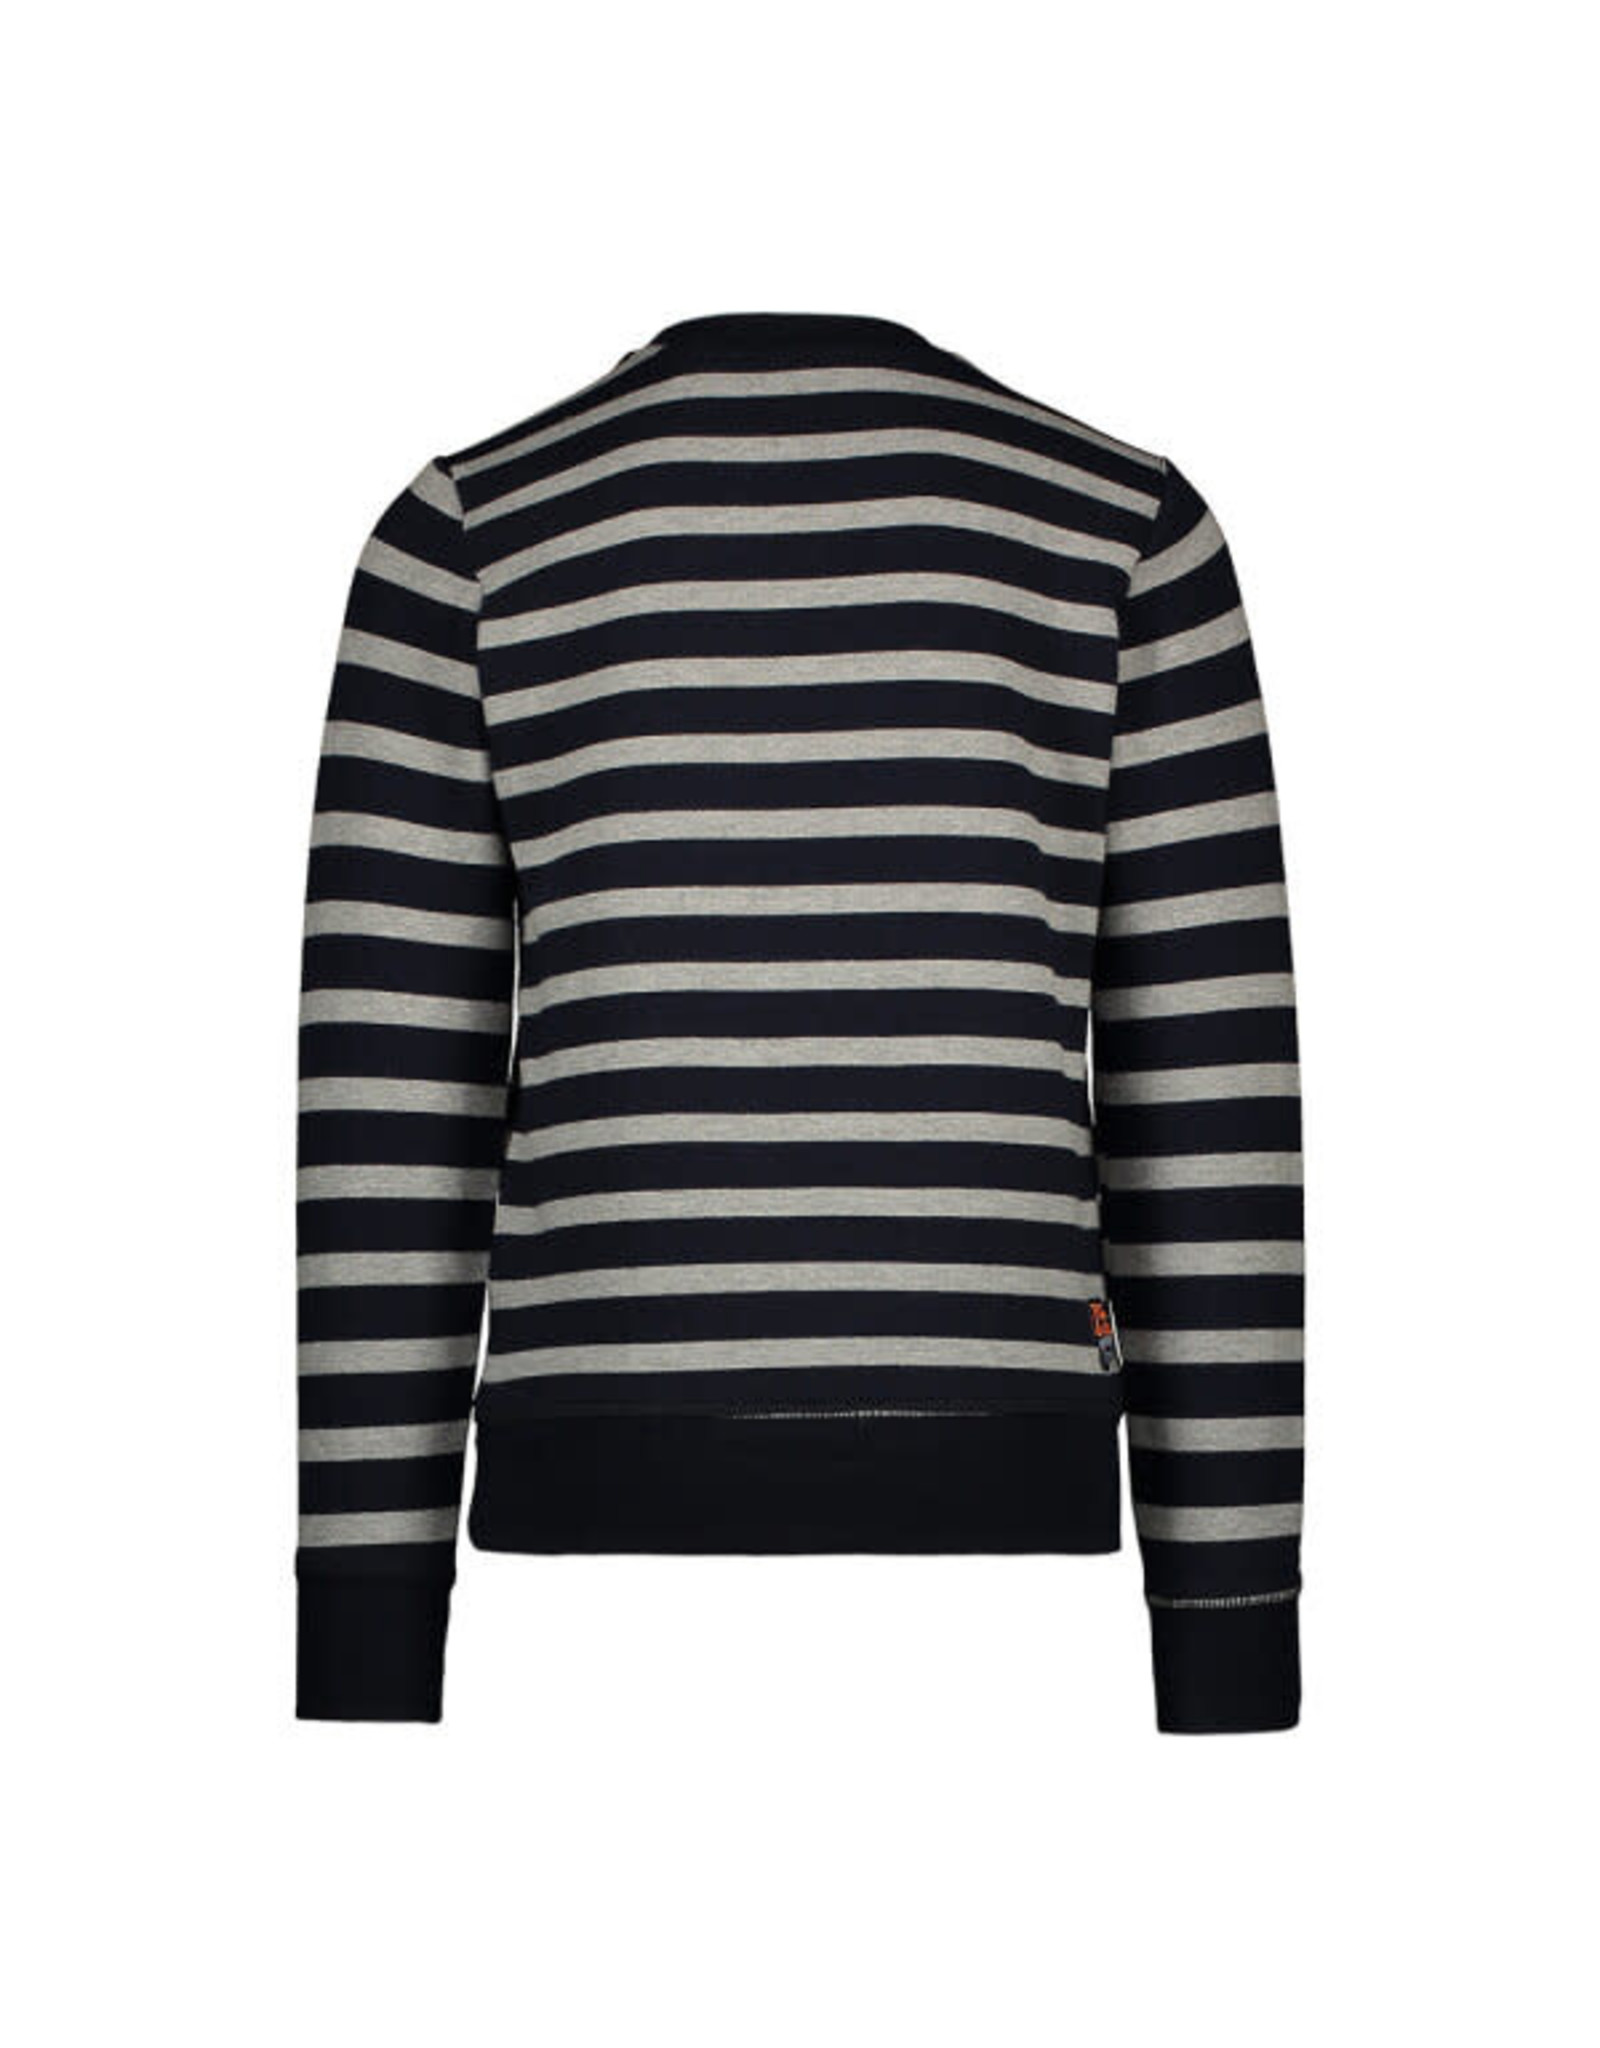 Tygo & vito X008-6306 Sweater